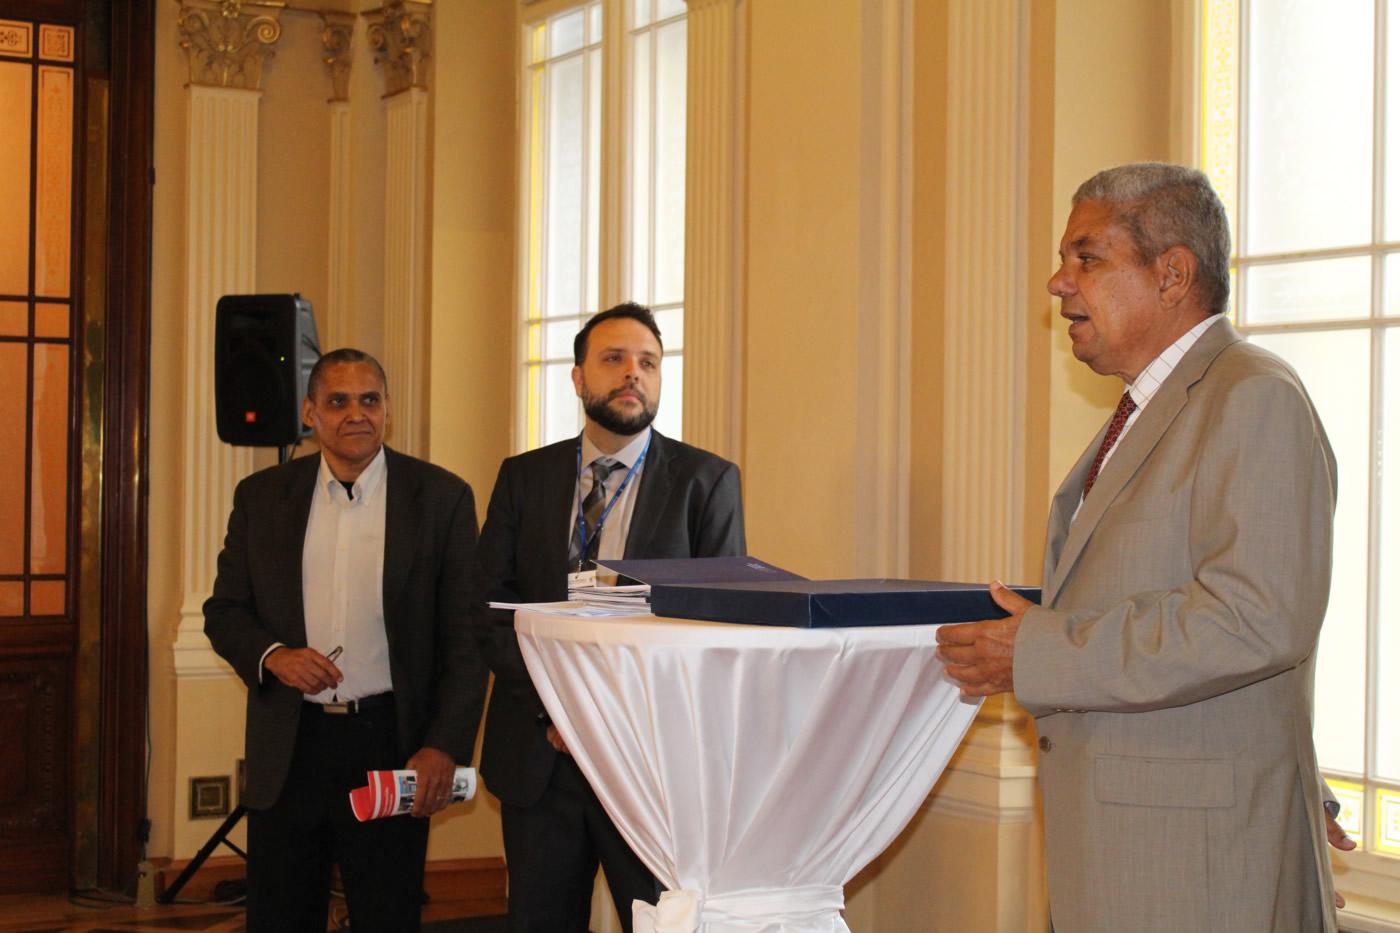 Un ex diplomático sueco recibe Premio en Praga